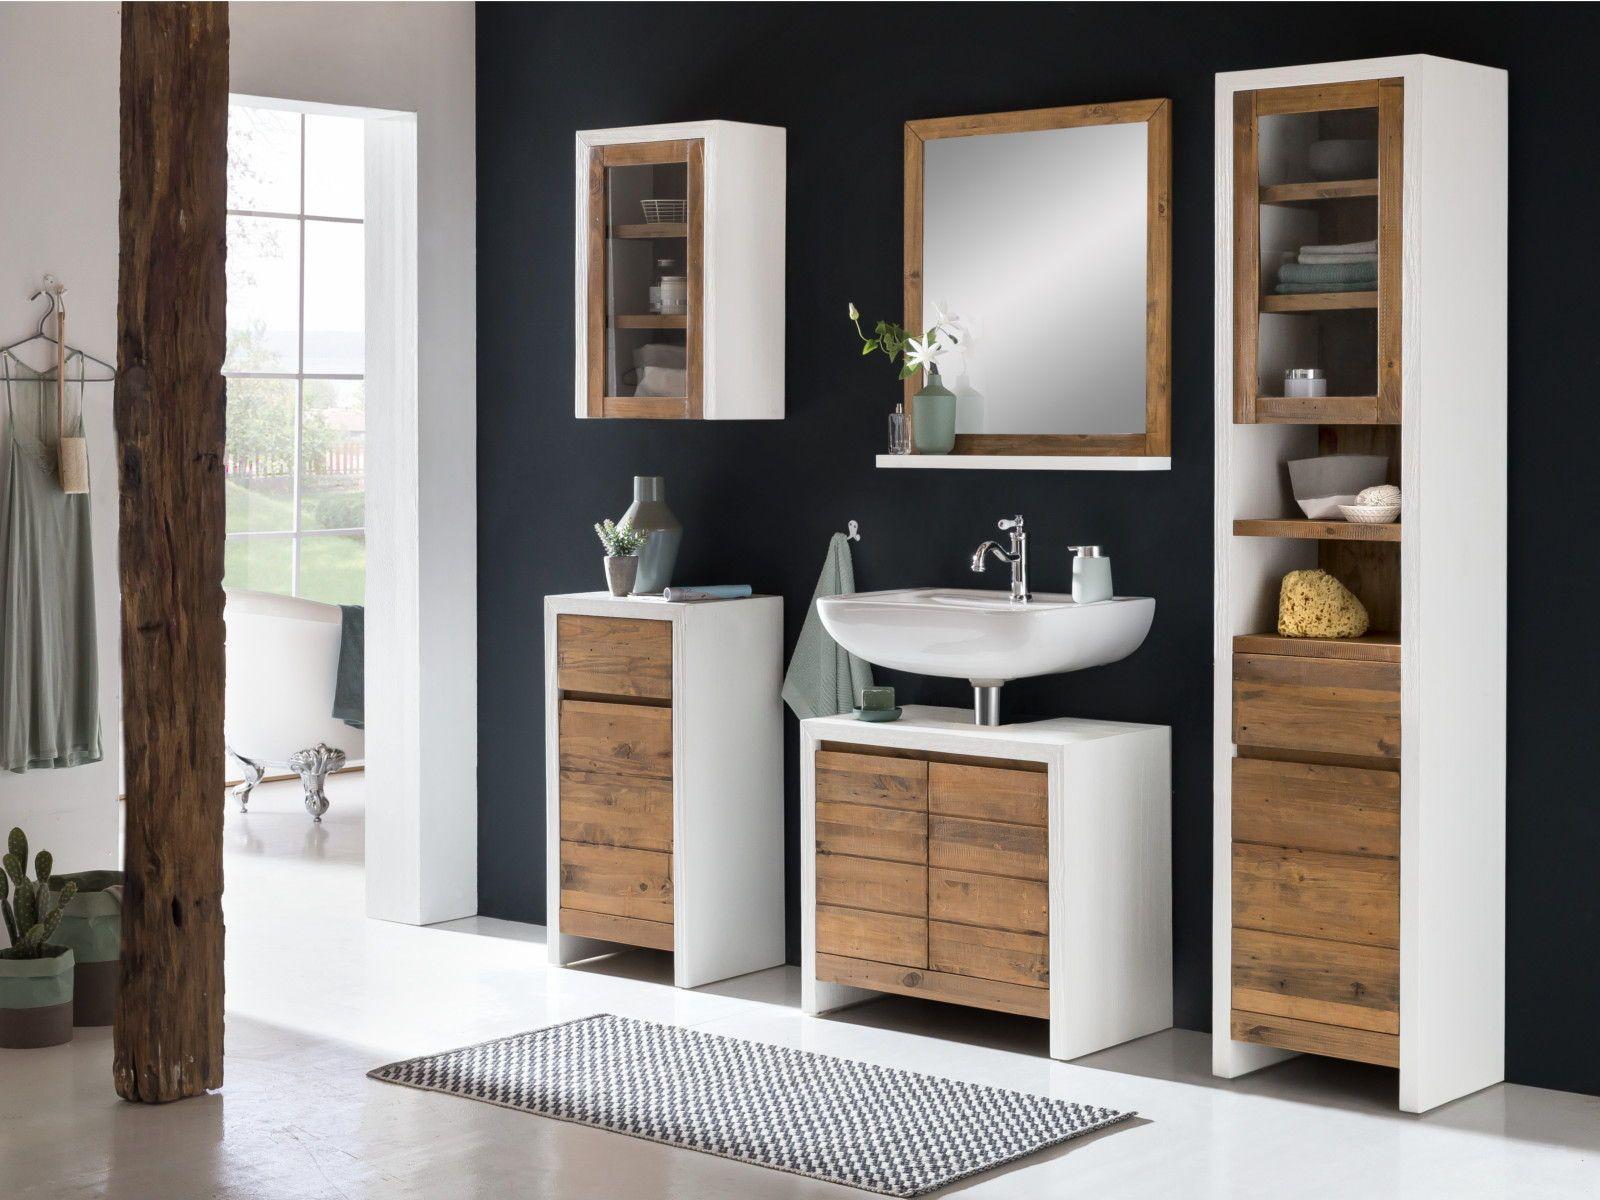 Woodkings Shop Waschbeckenunterschrank Badezimmermobel Holz Bad Set